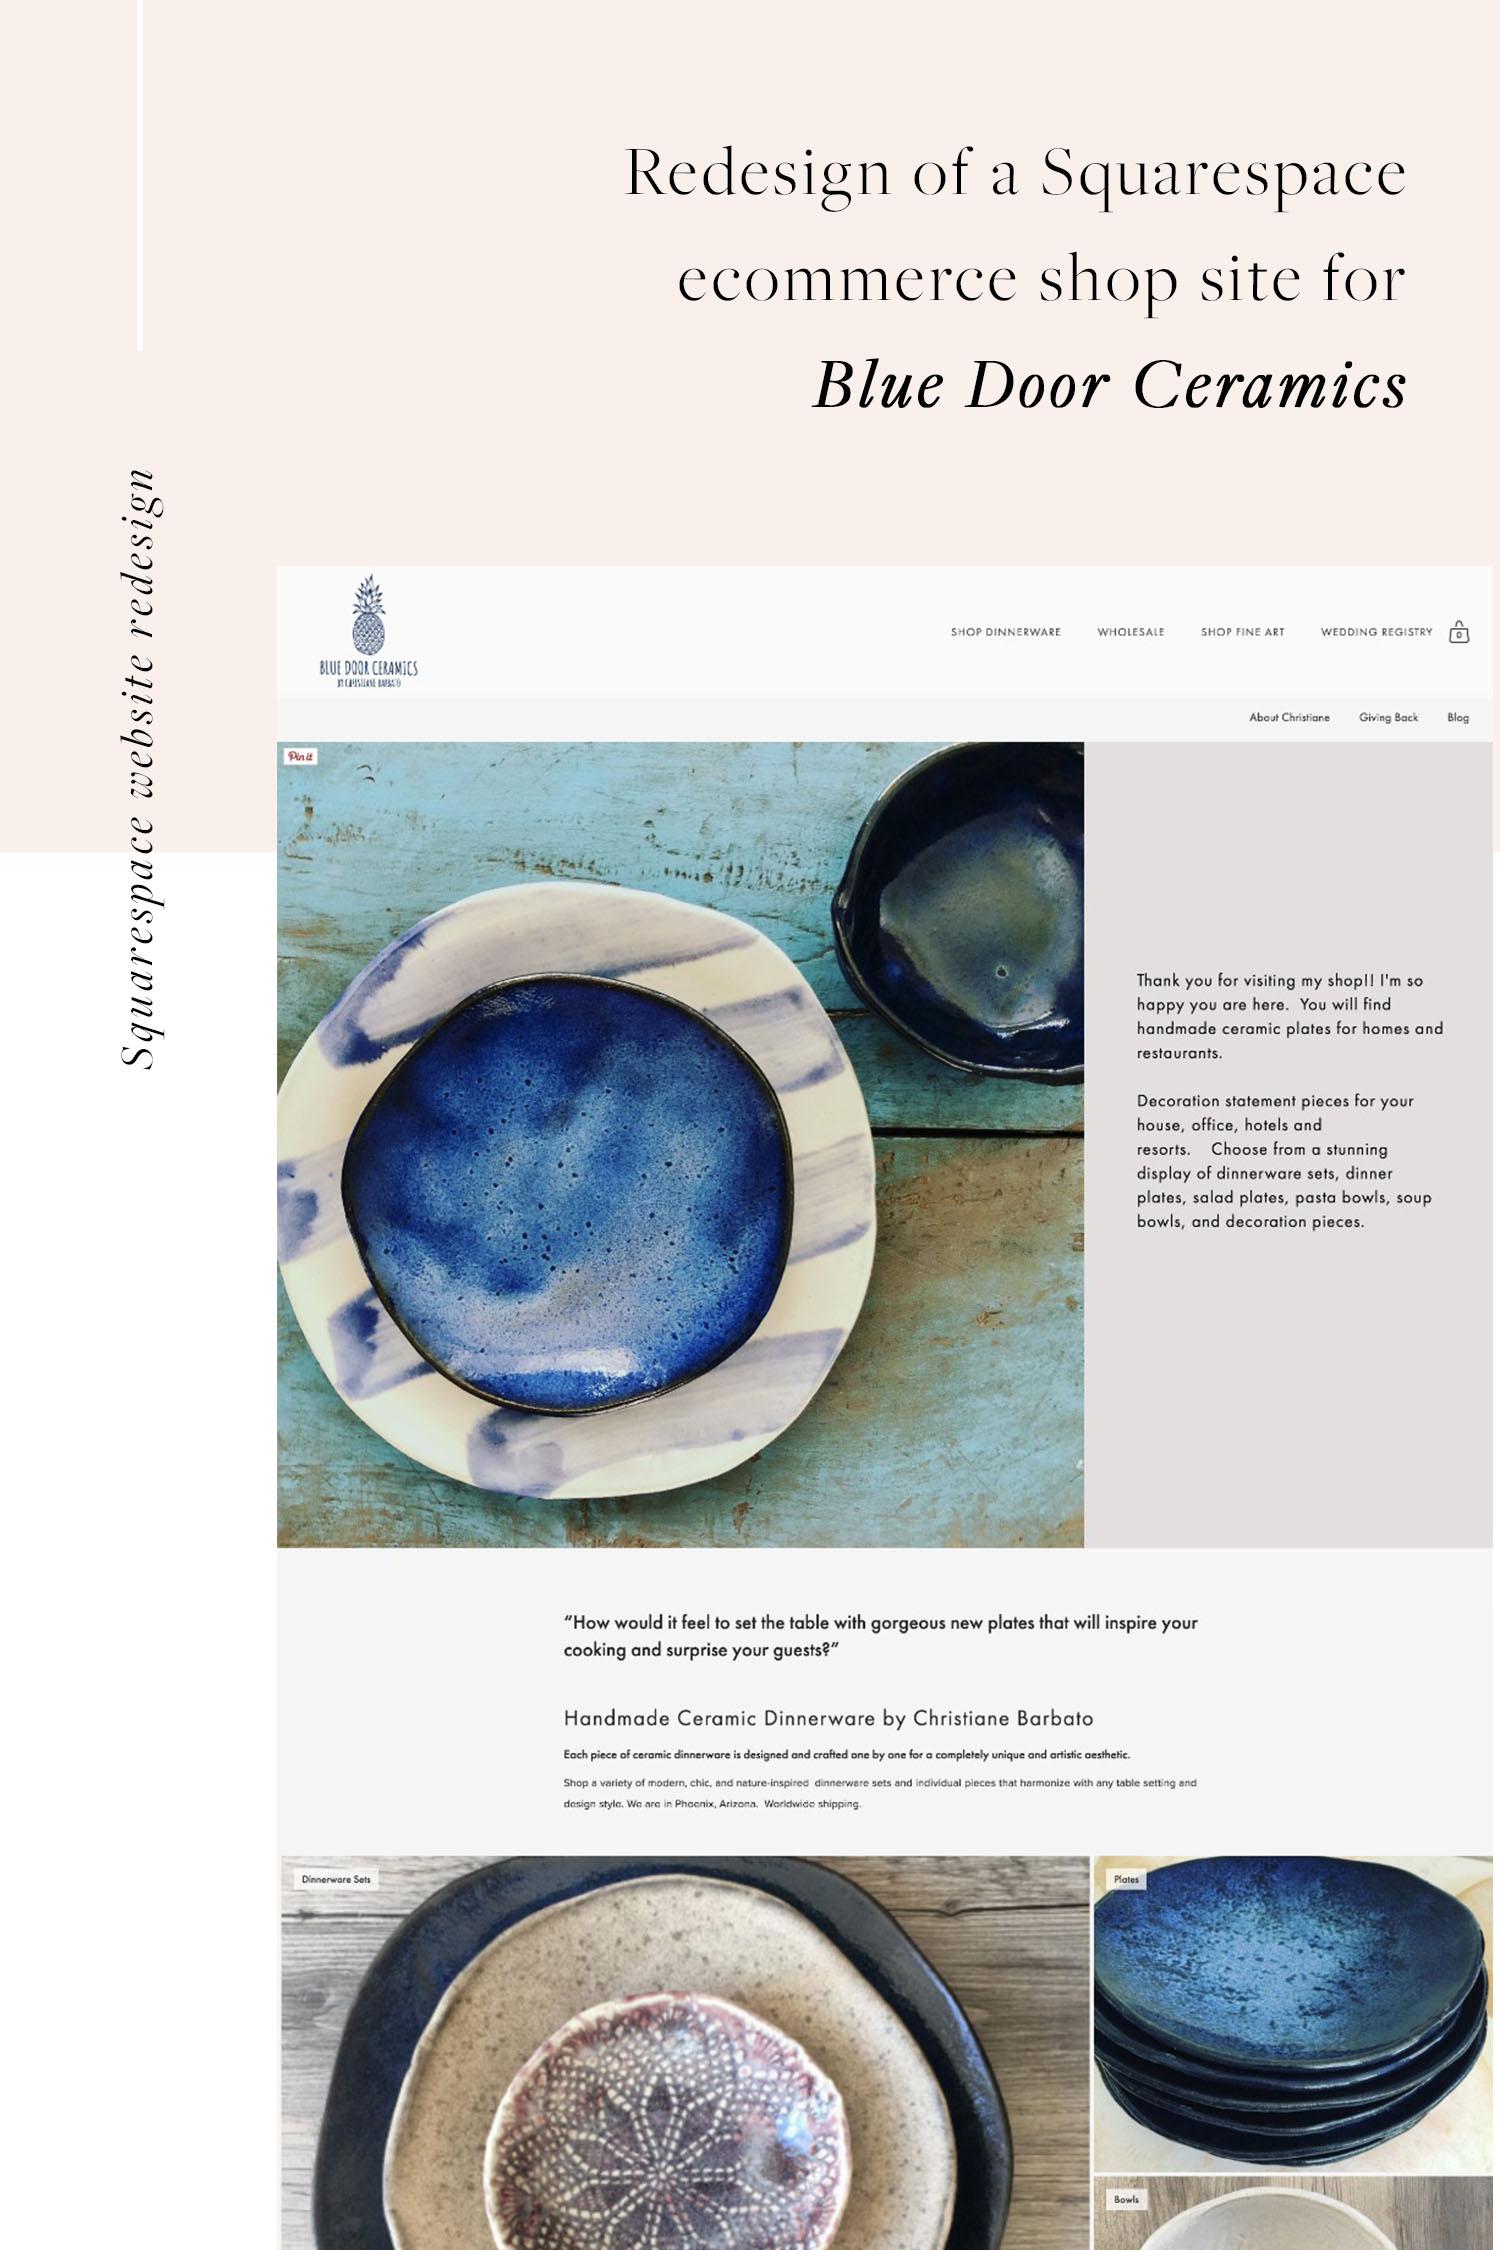 Squarespace website redesign for a ceramics shop | by Jodi Neufeld Design